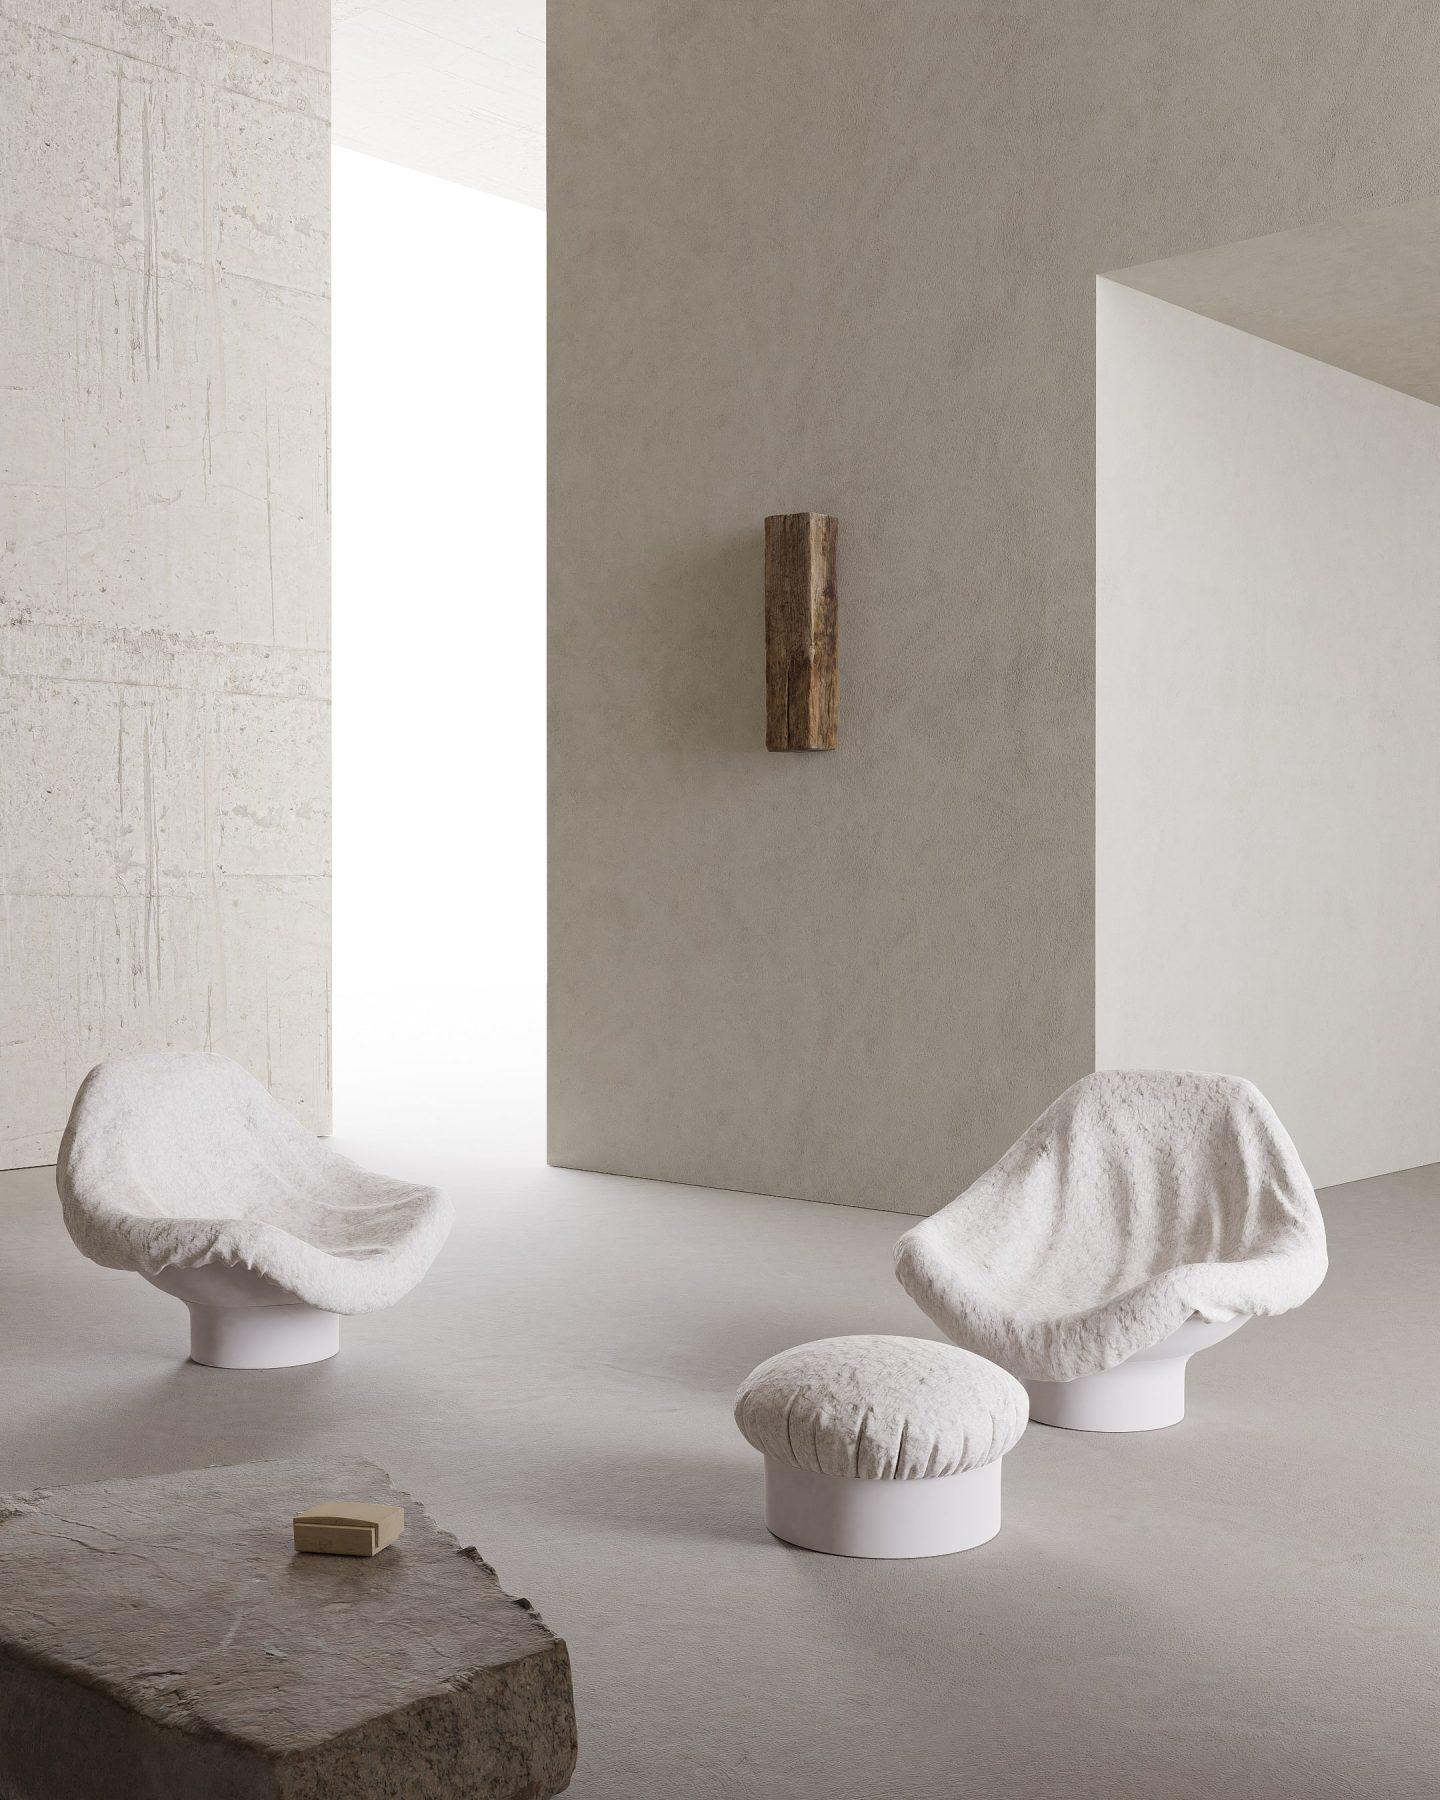 IGNANT-Design-Interview-Osminina-24